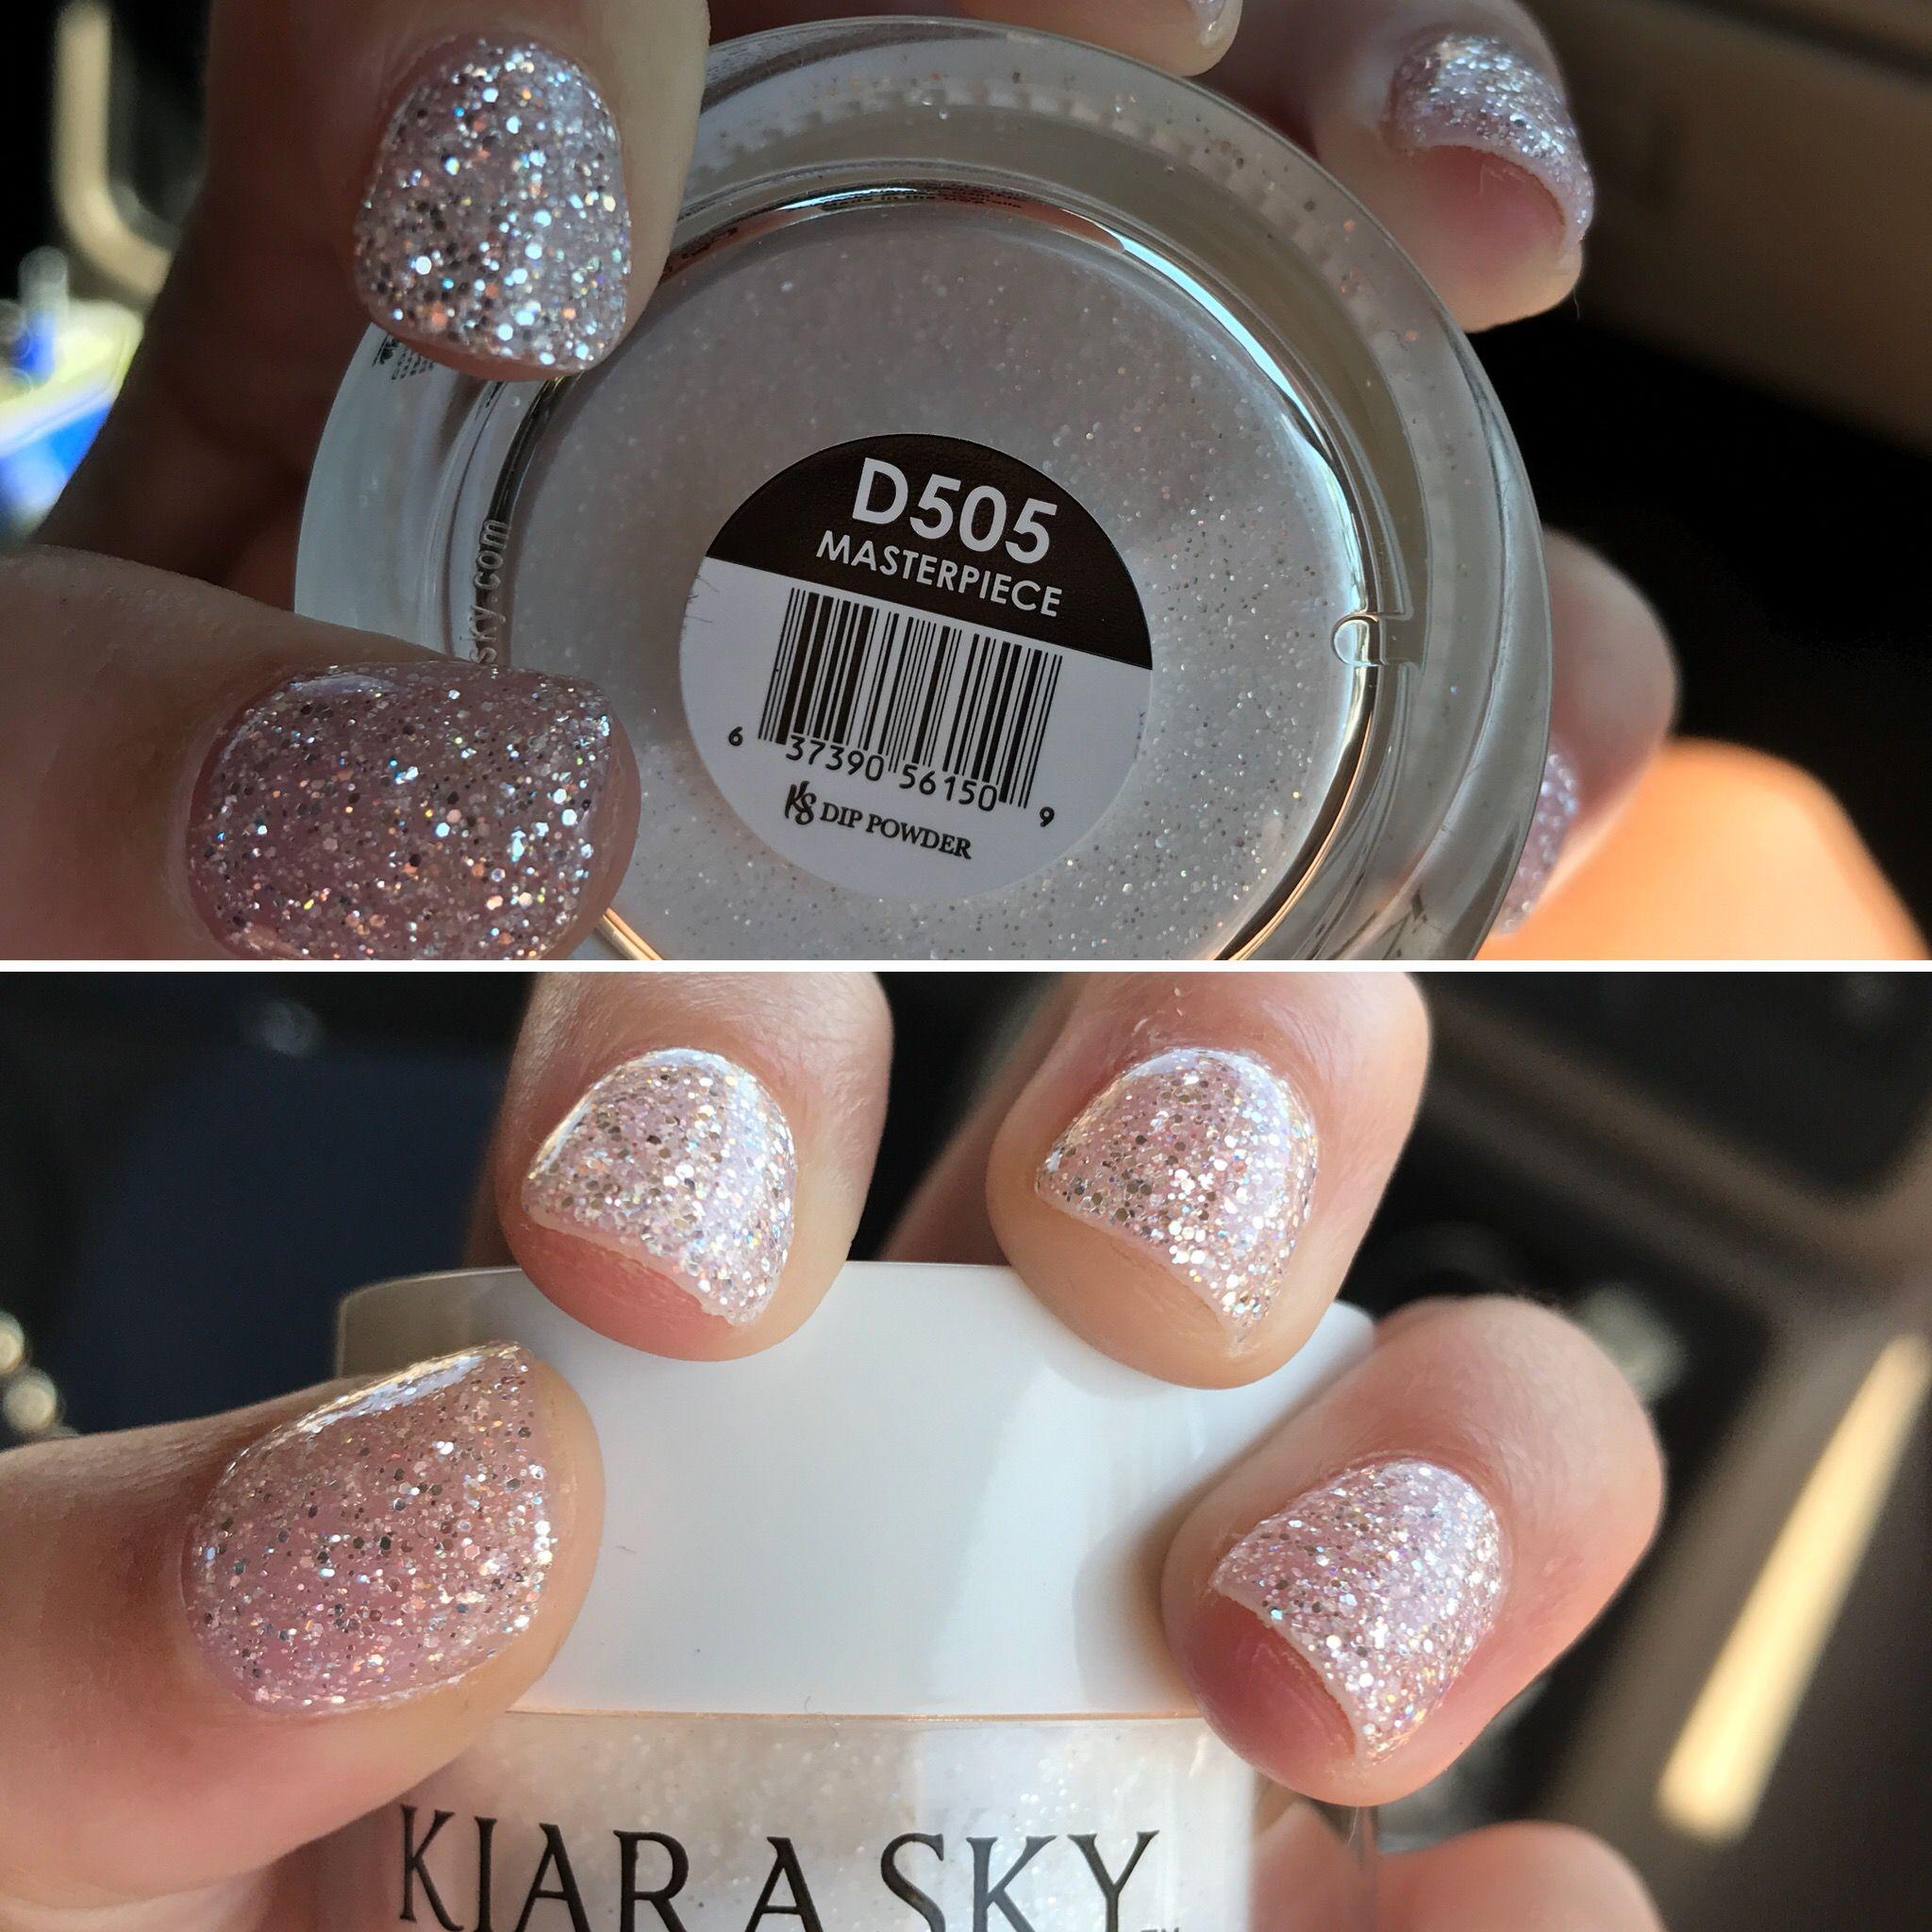 Kiara Sky Nail Powder in Masterpiece | nails! | Pinterest | Sky ...